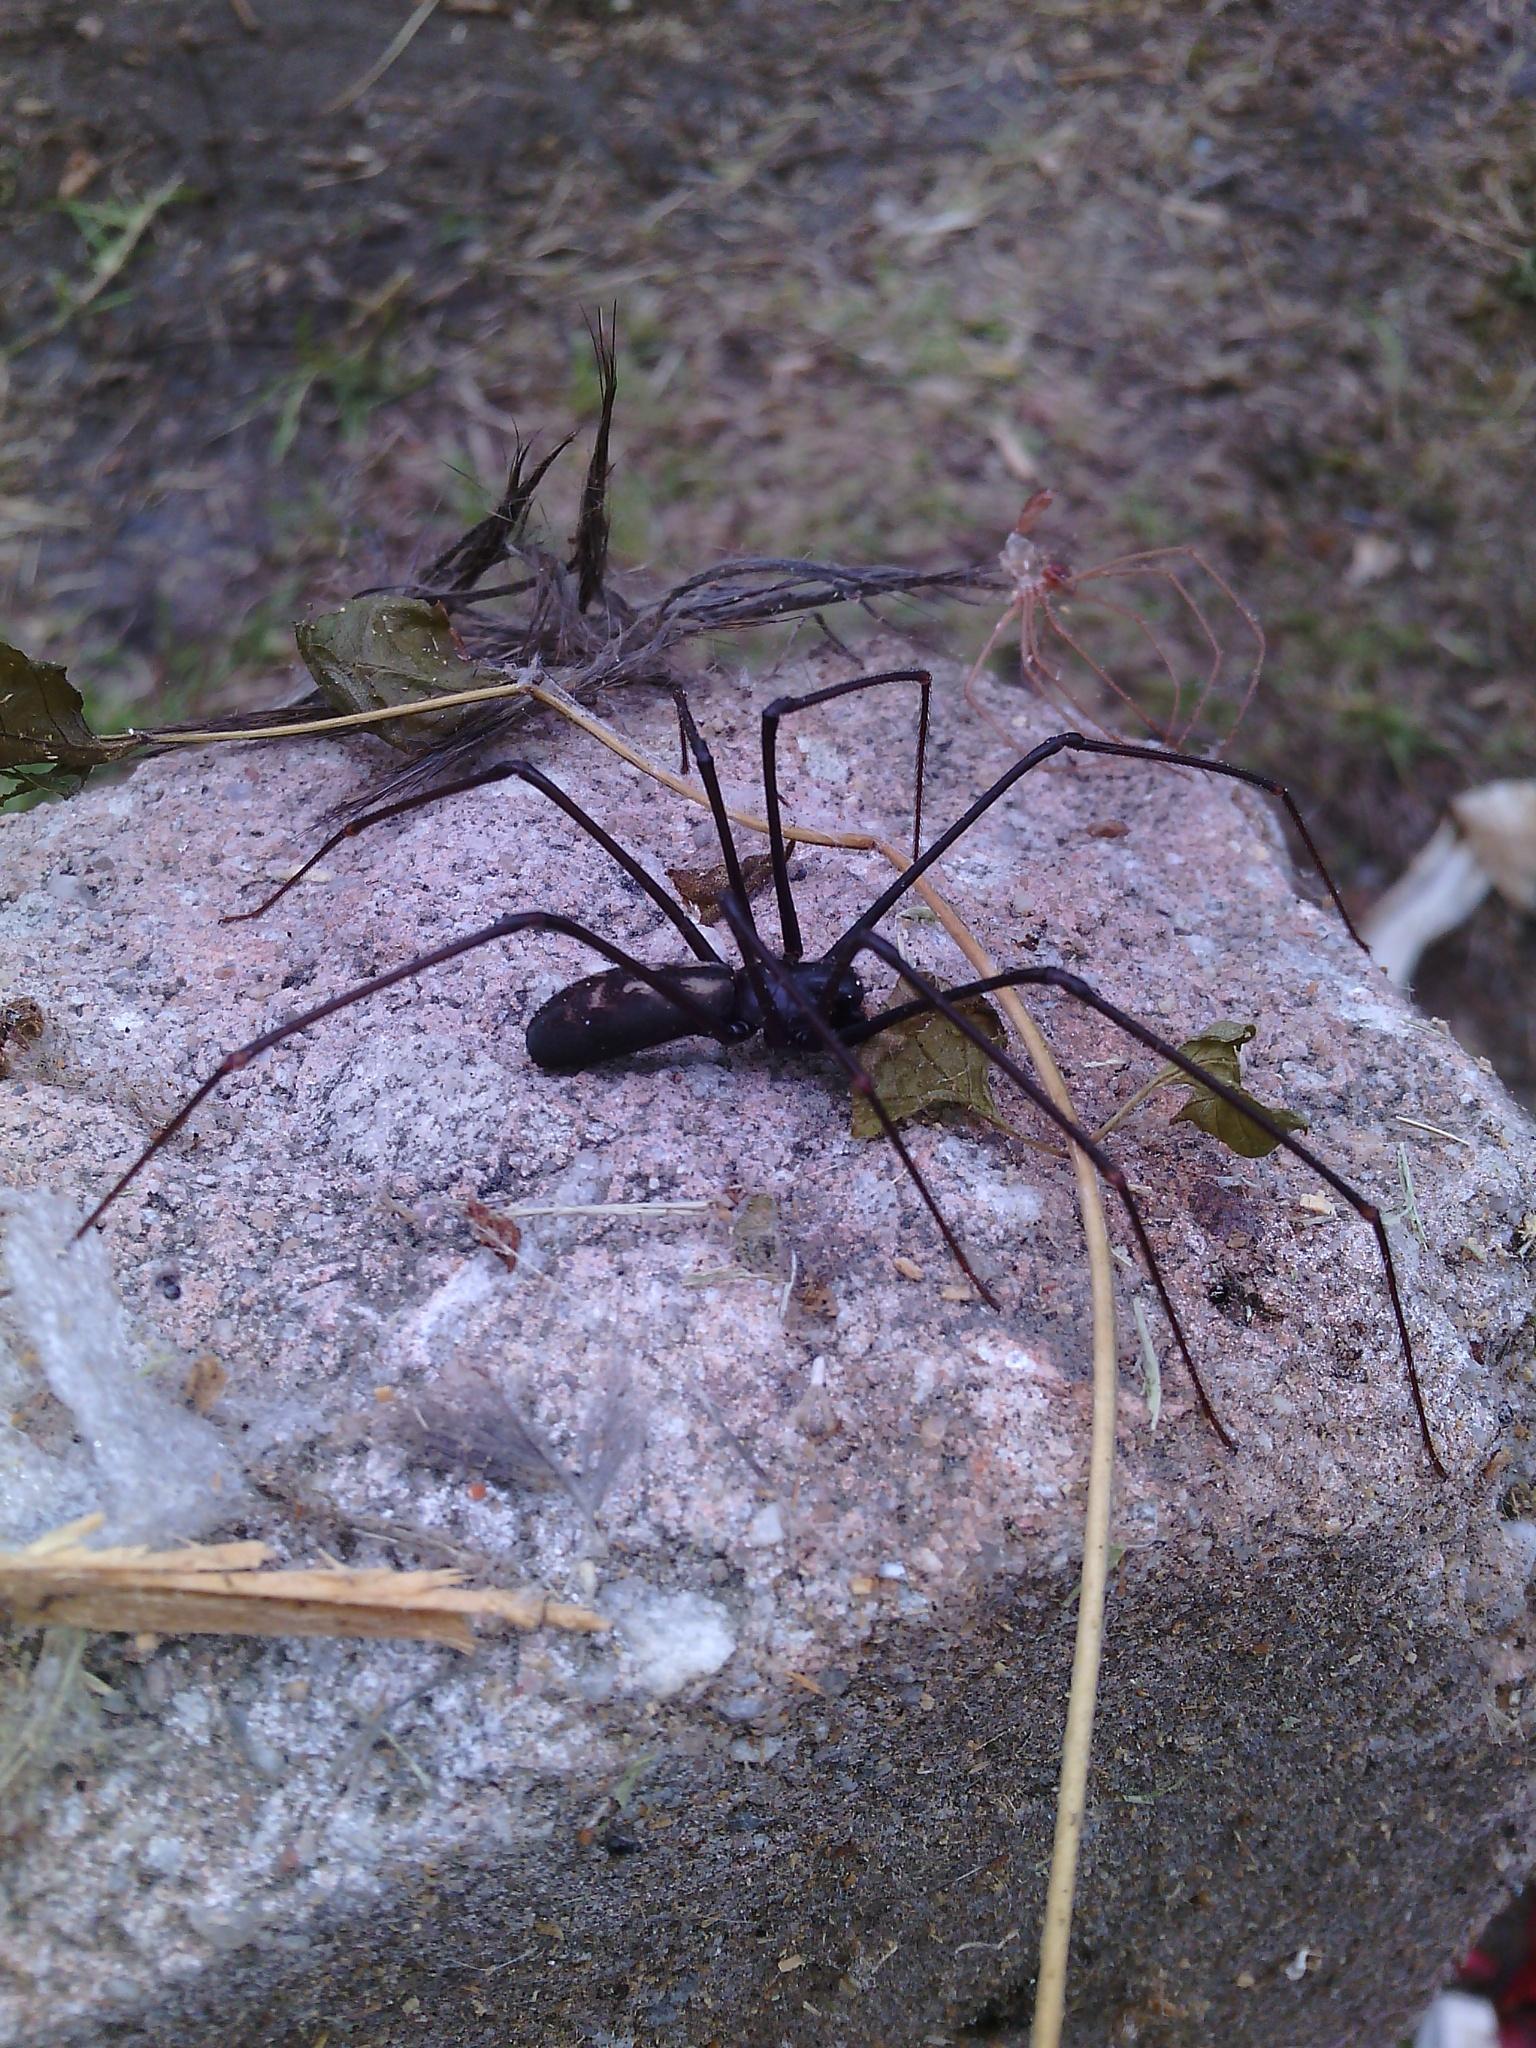 False Violin Spider (Drymusa capensis) by shantellelottering